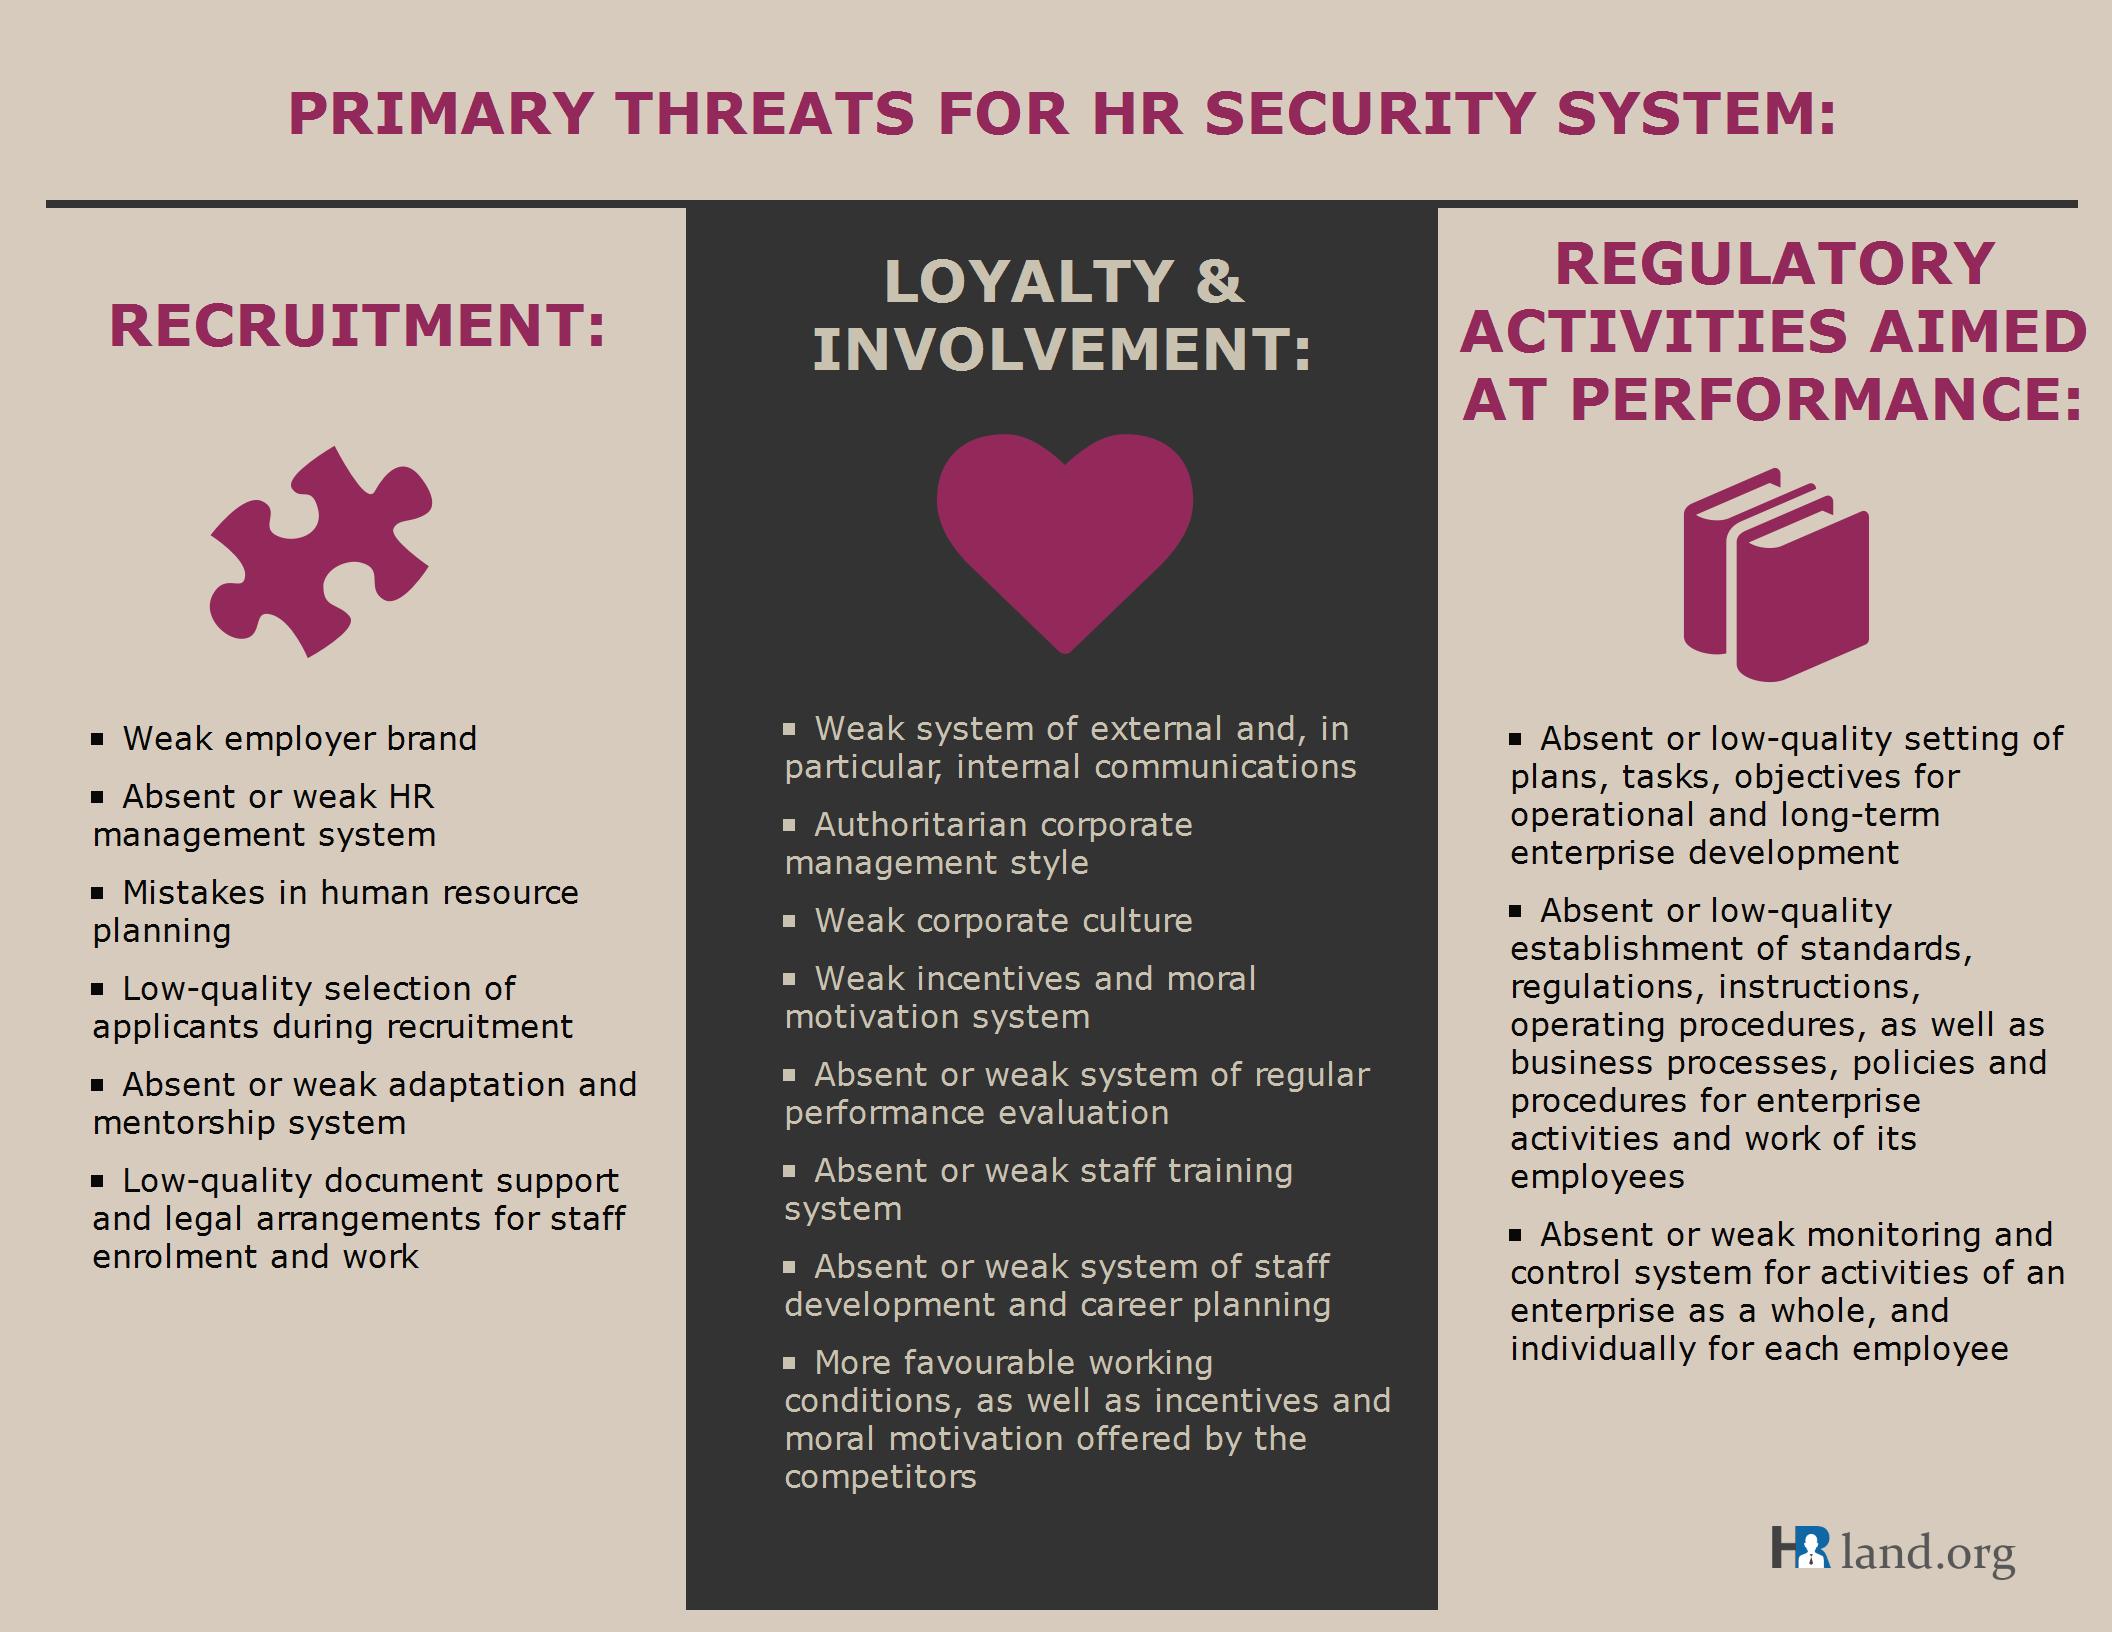 HR Security